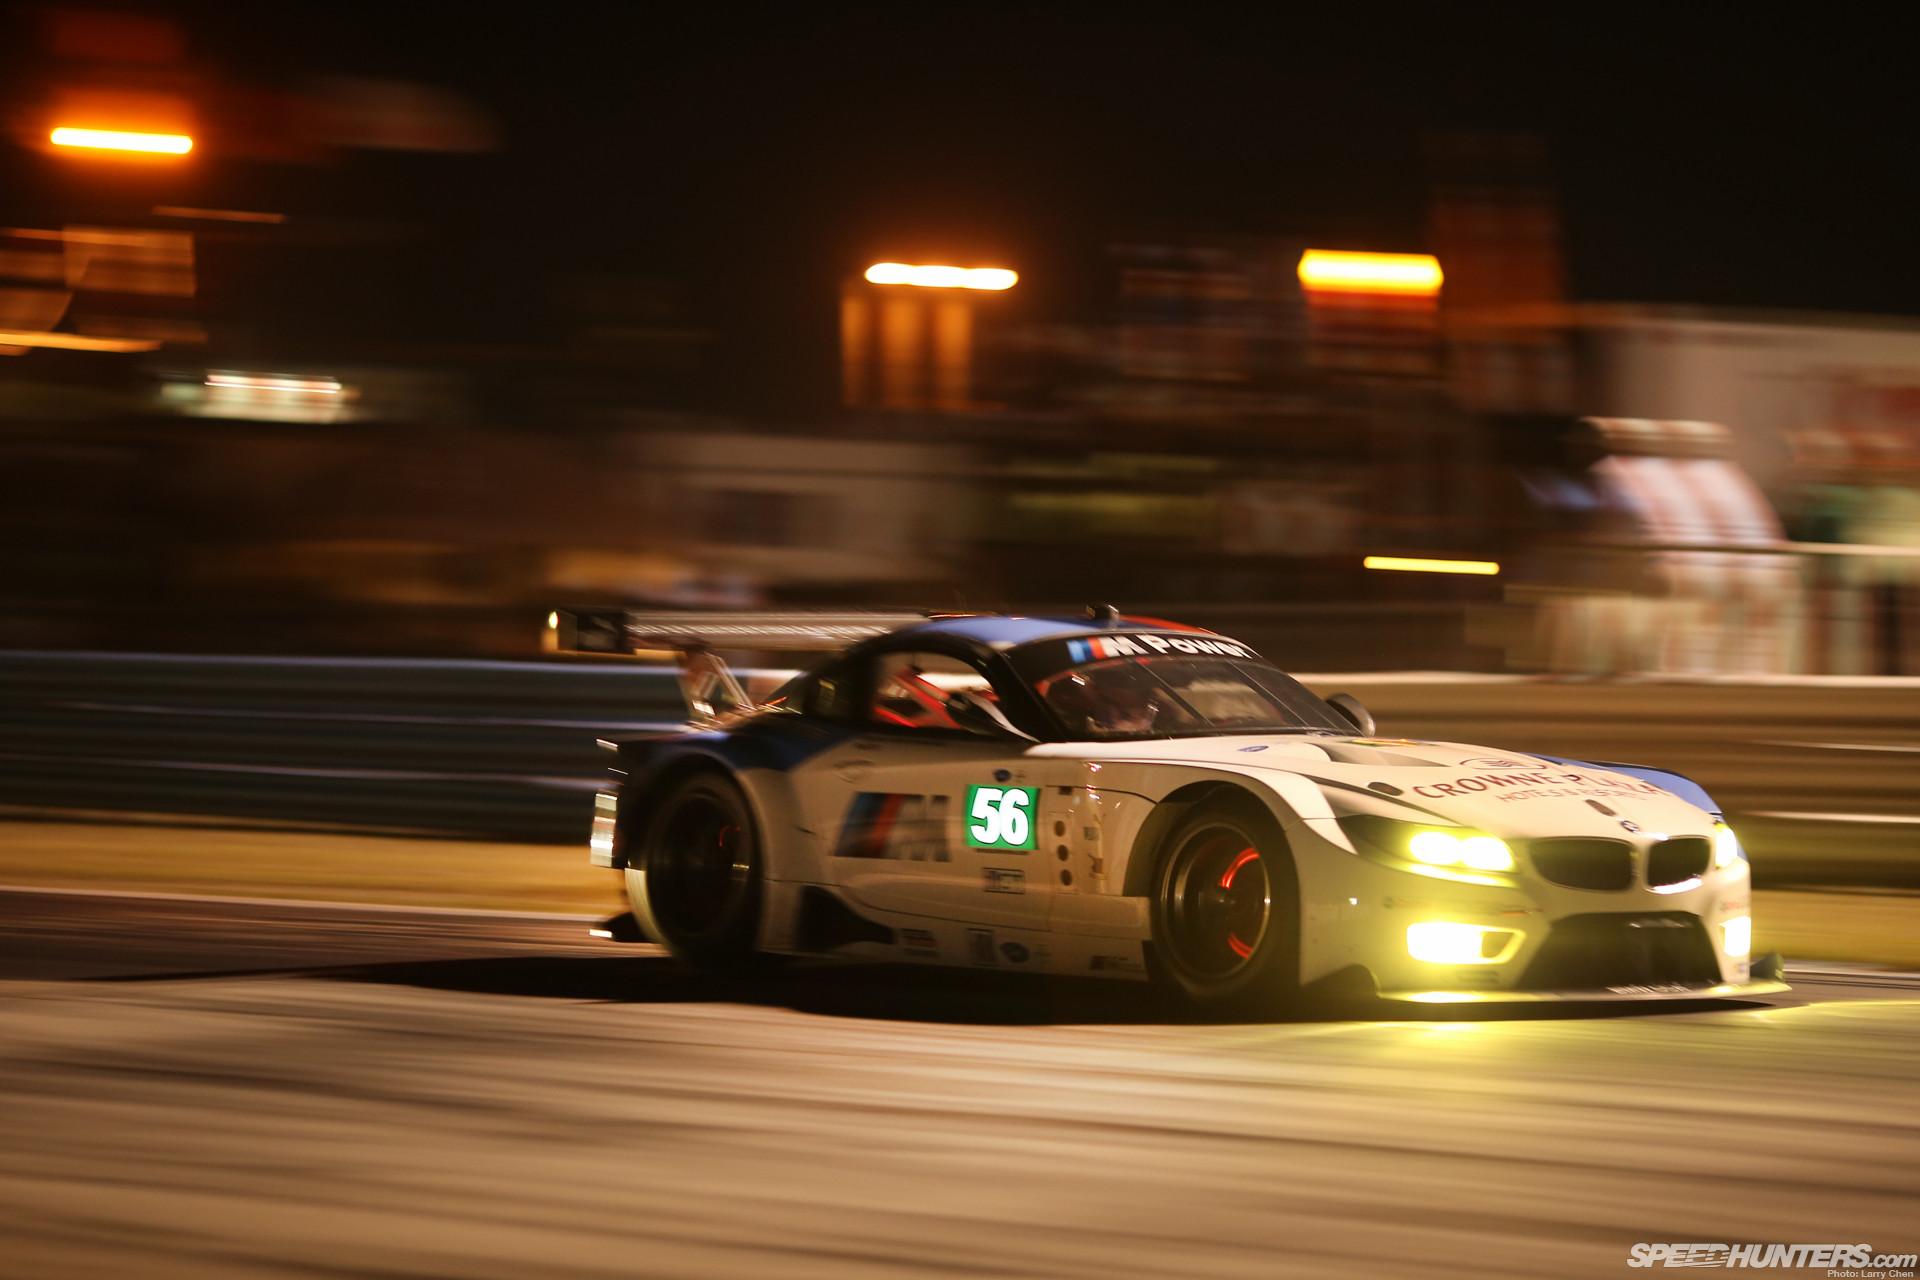 Res: 1920x1280, BMW Z4 Race Car Glowing Brakes Motion Blur Night racing roads tuning  wallpaper |  | 55099 | WallpaperUP